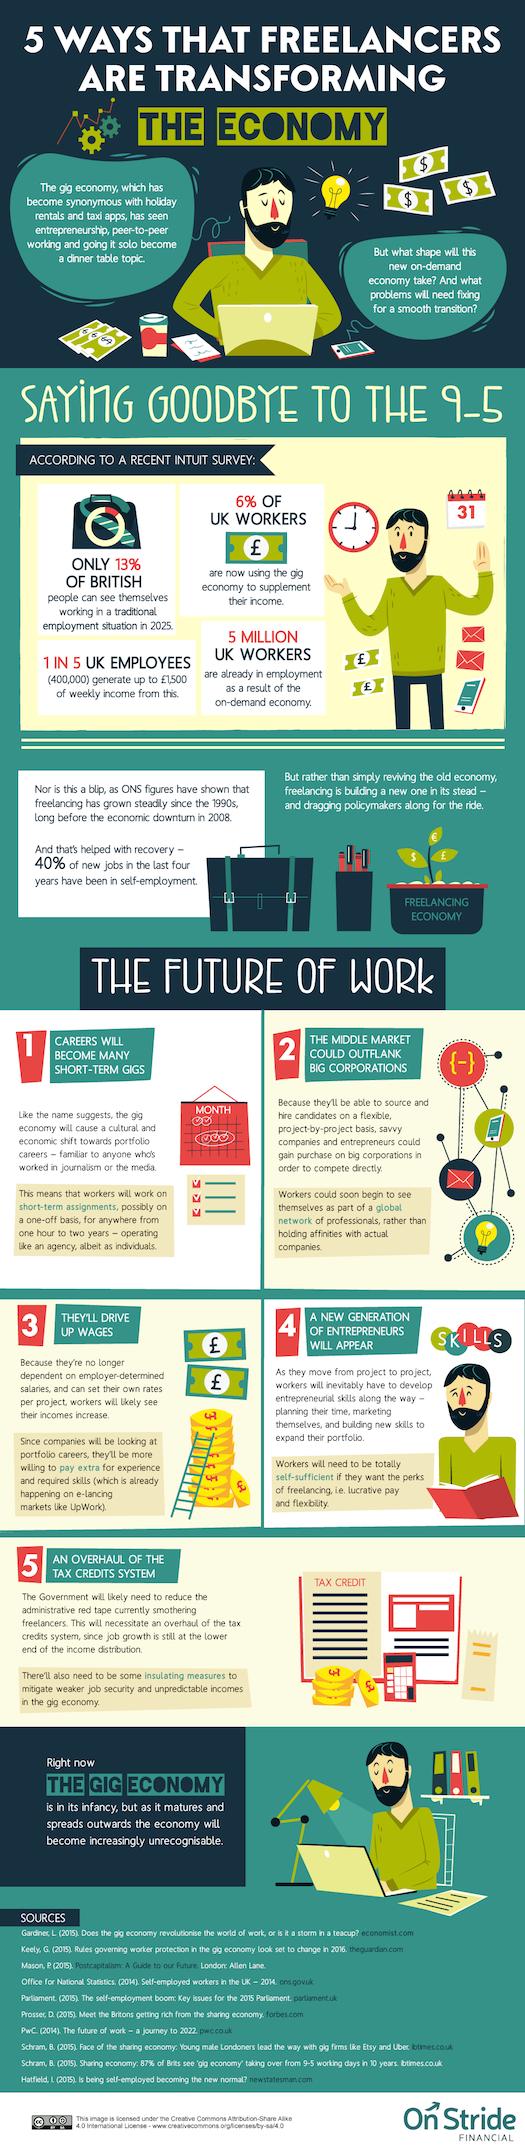 freelancers-transforming-economy-V2